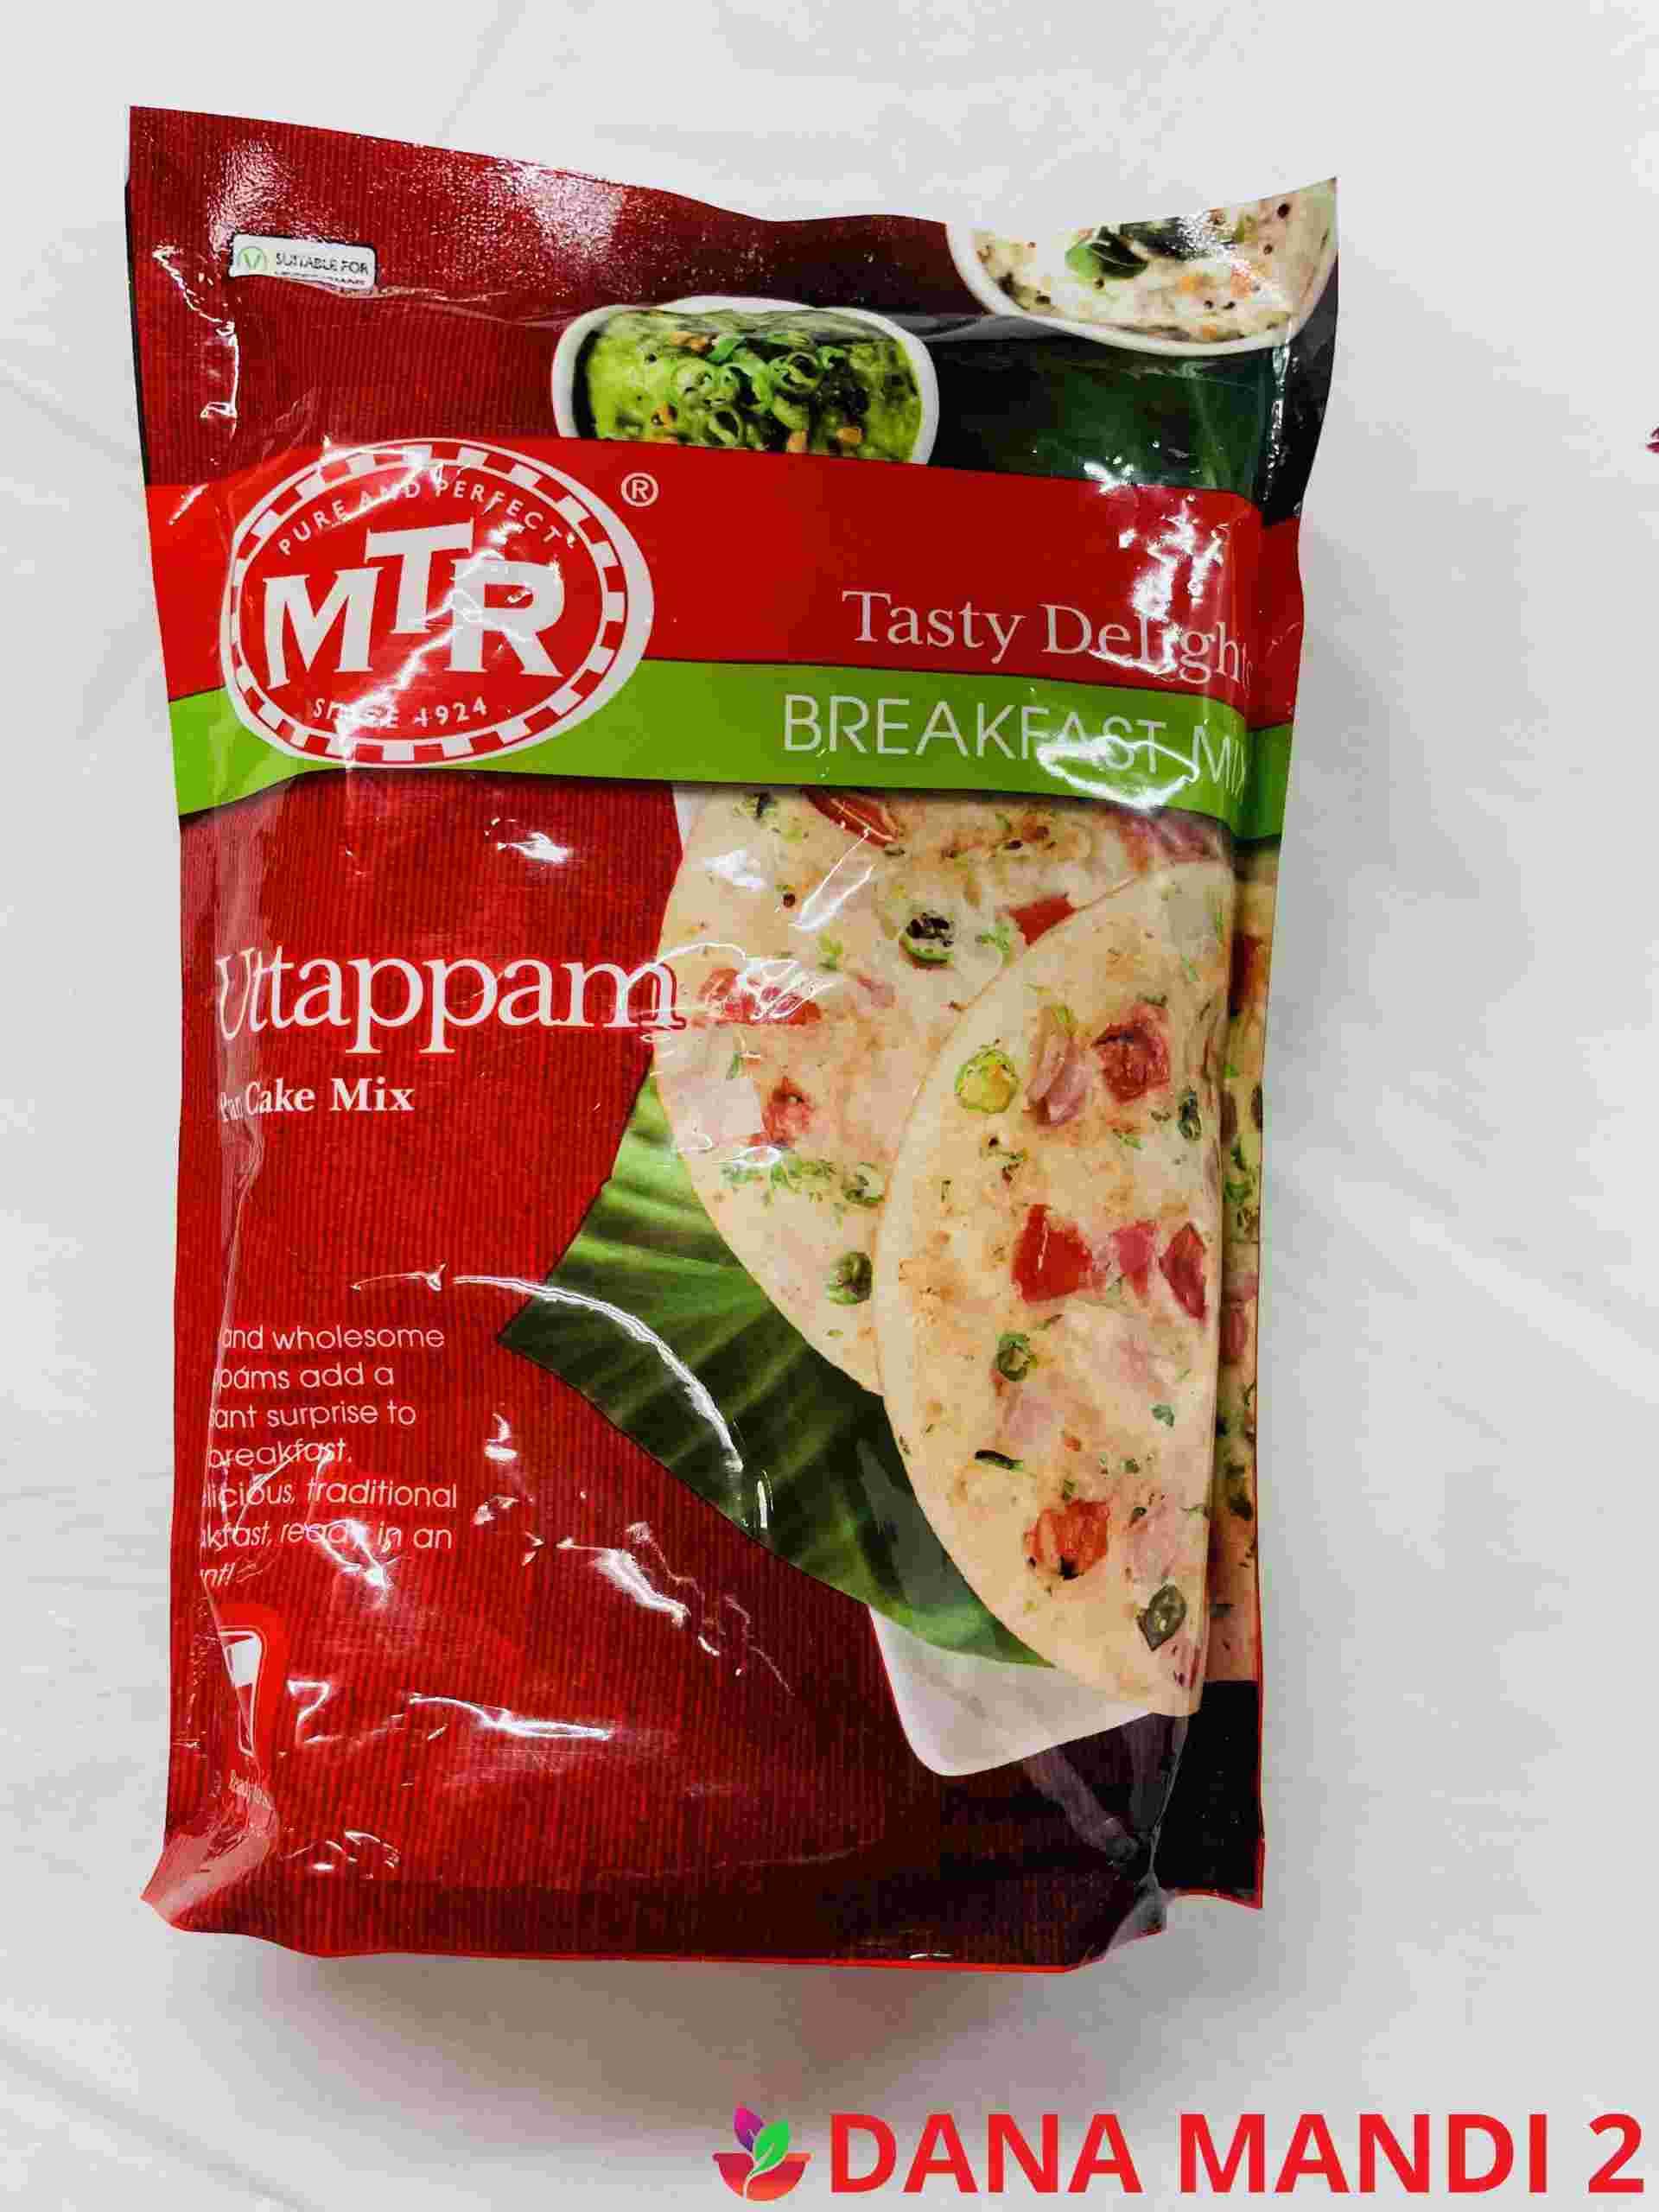 MTR Uttappam Breakfast Mix